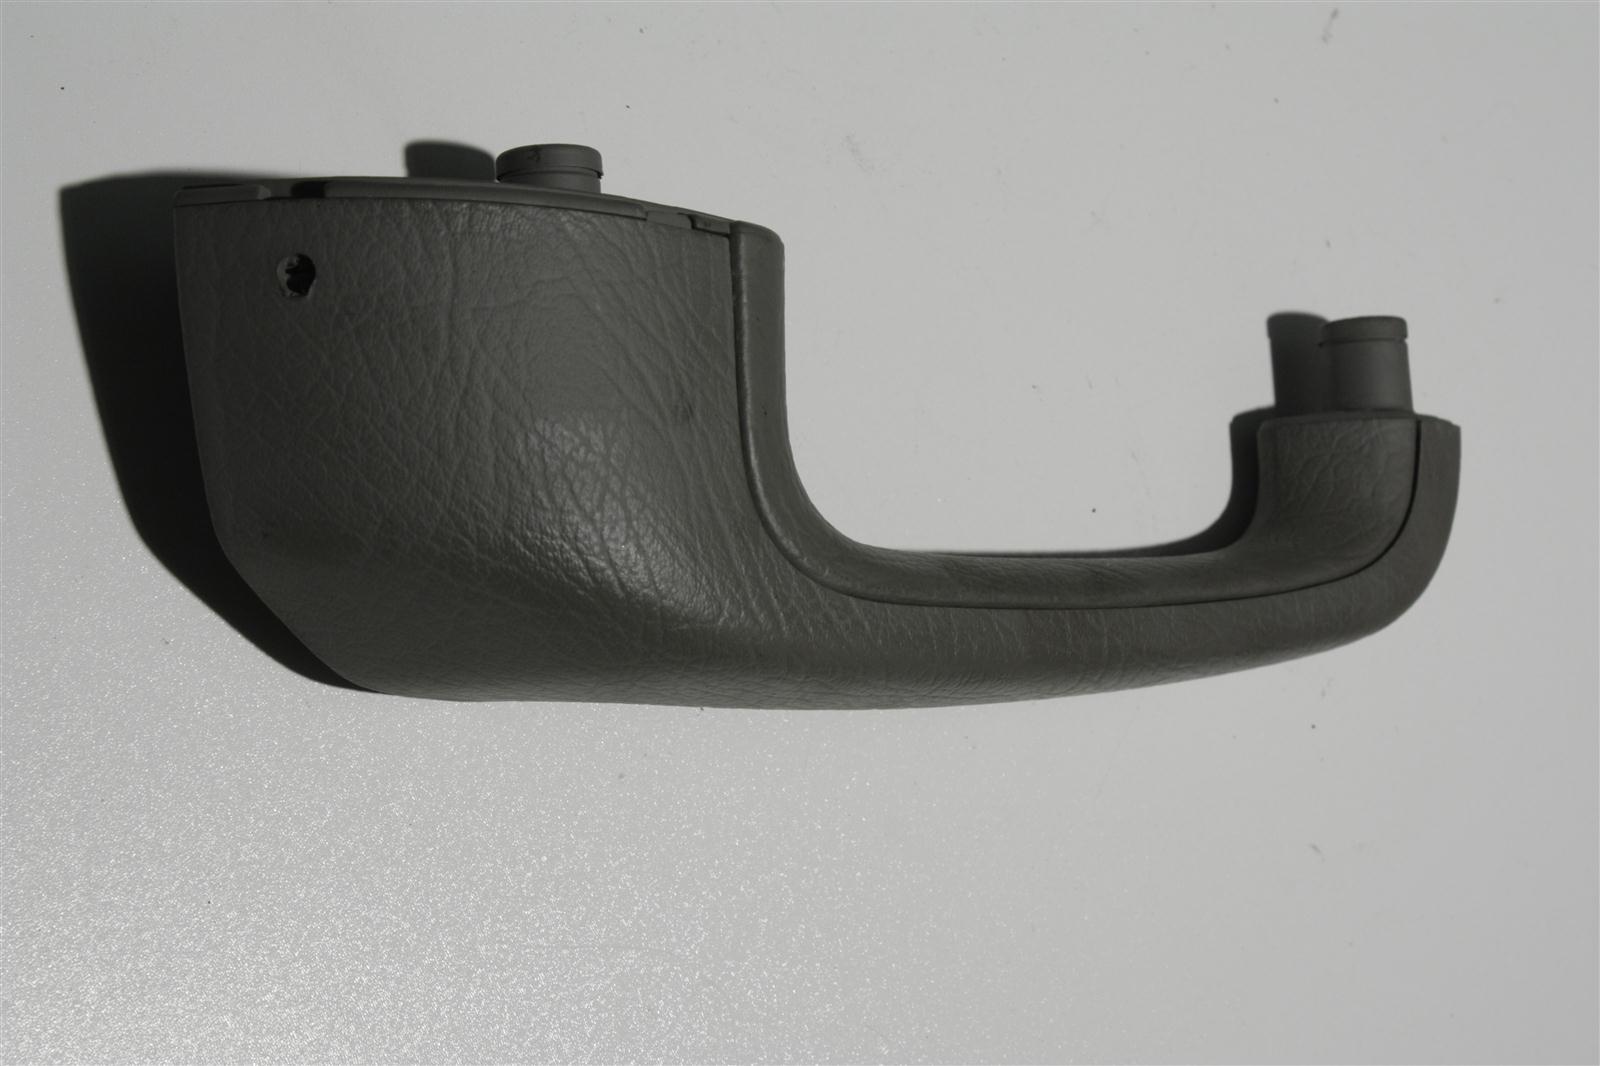 Audi 100/A6 C4 Haltegriff Hinten Rechts platin 4A0867372